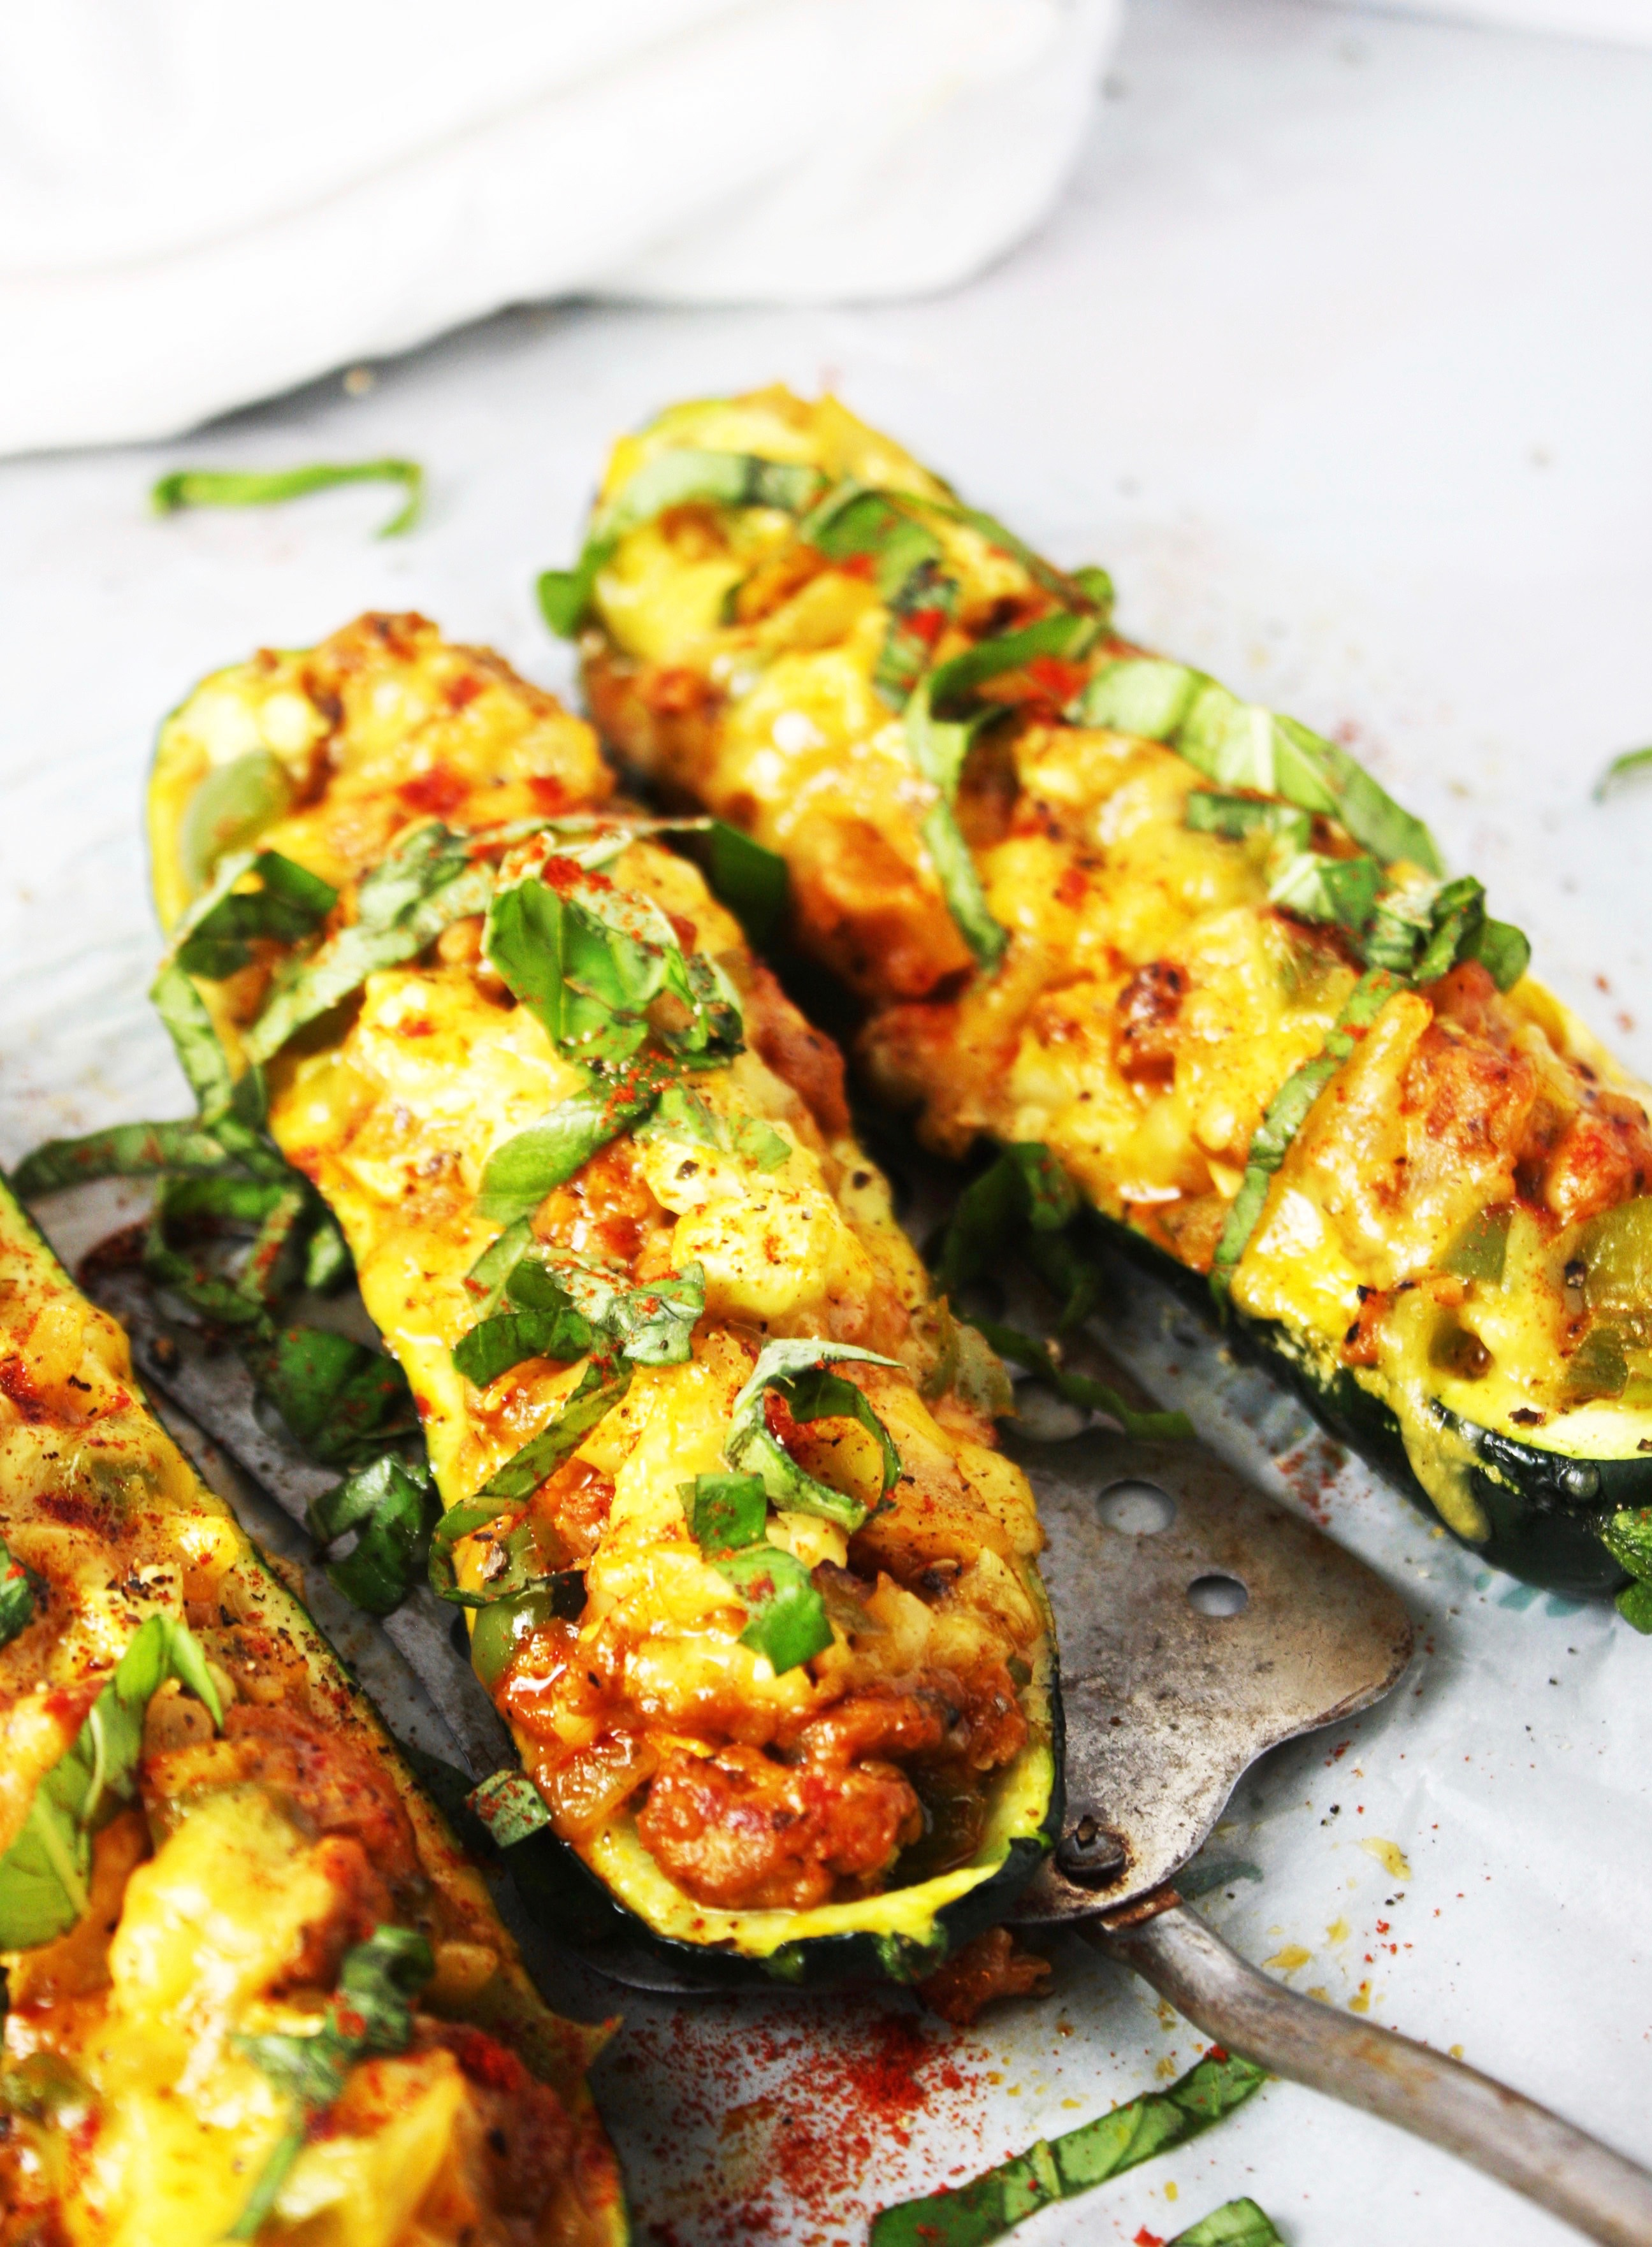 Cheddar and Sausage Stuffed Zucchini Boats